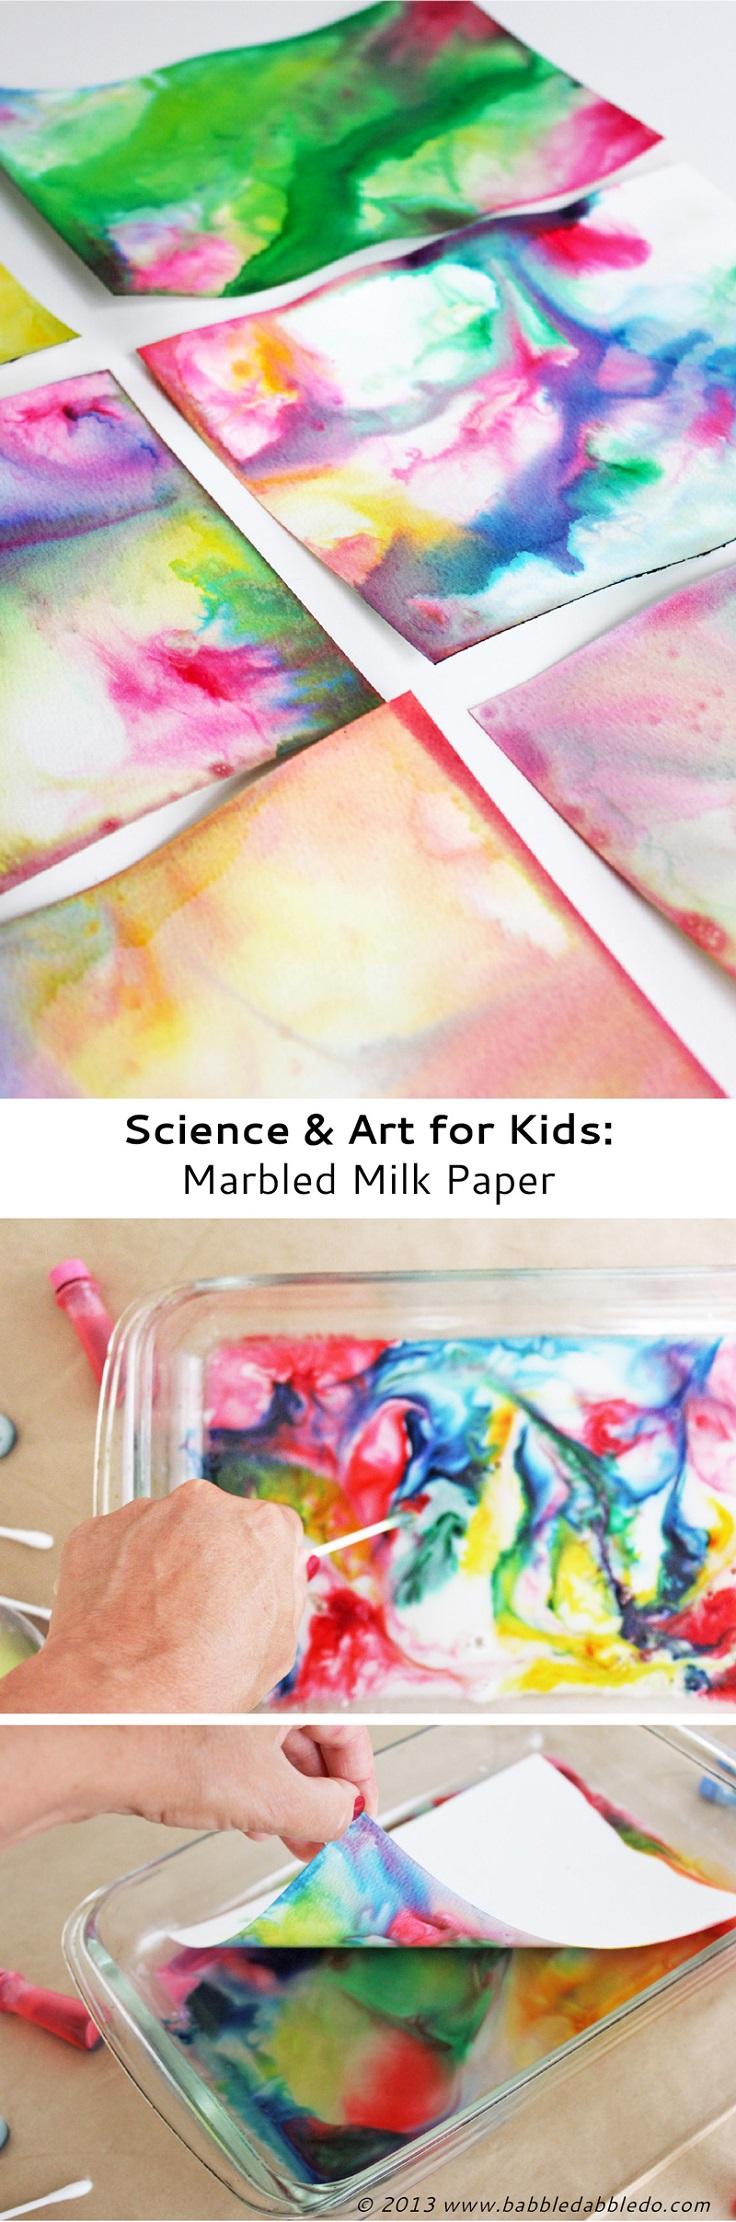 Marbled-Milk-Paper